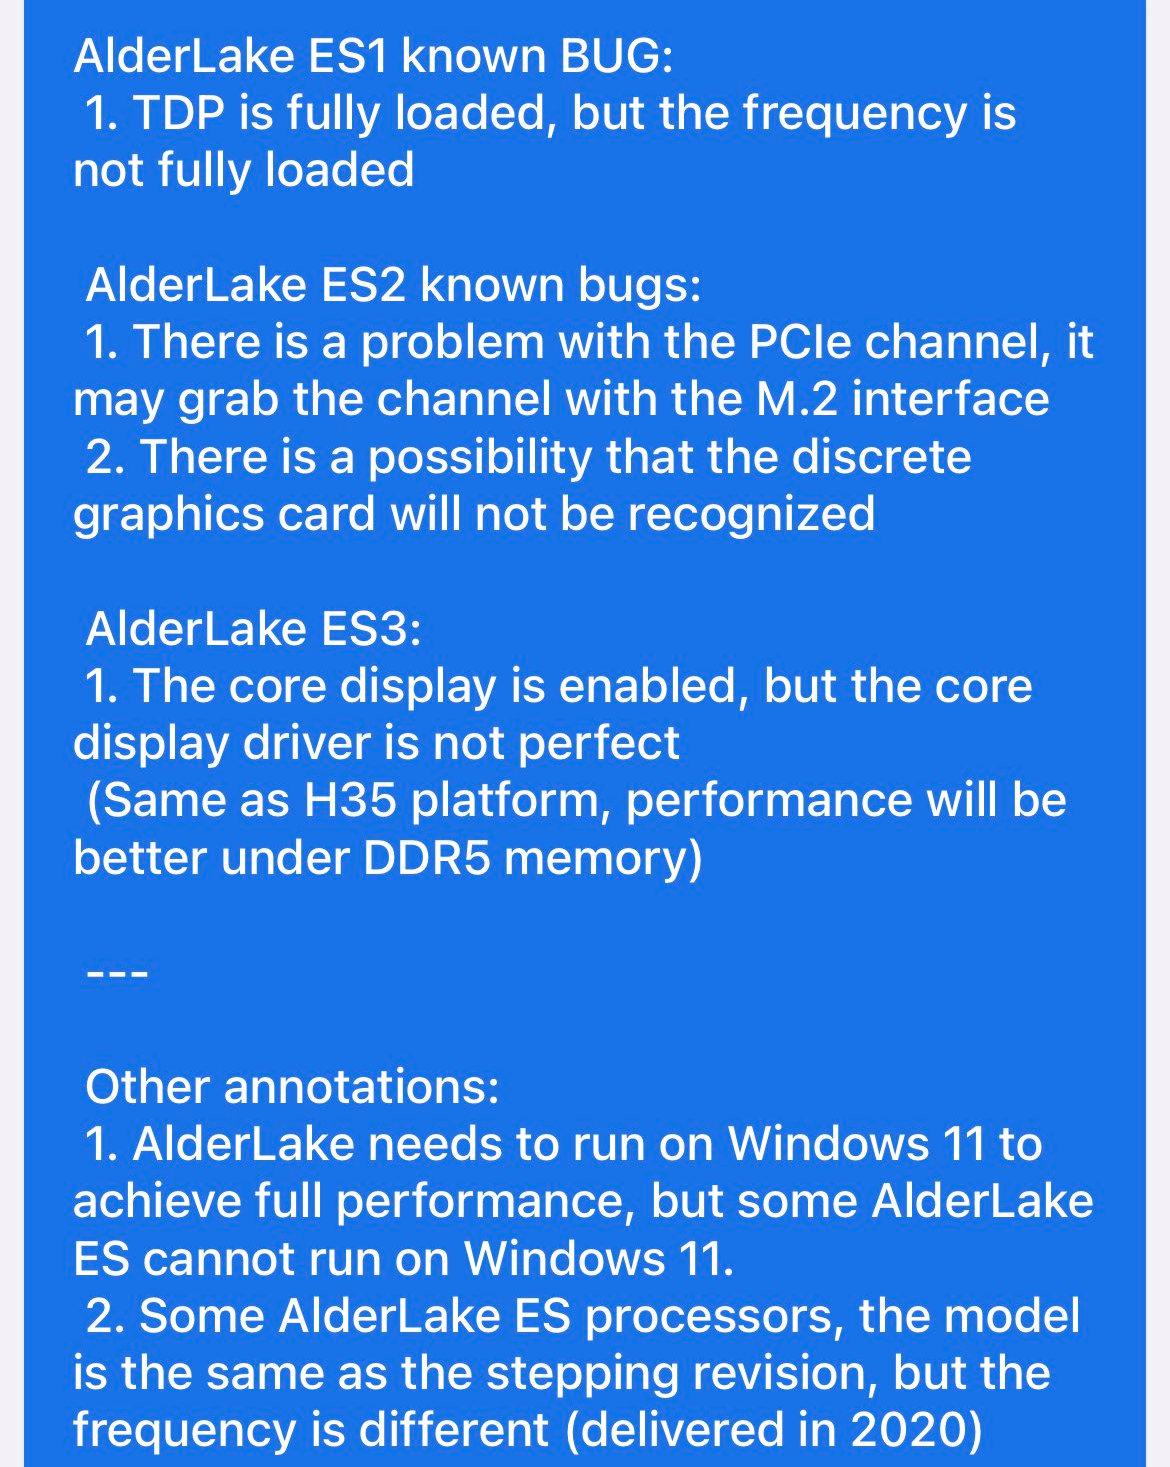 Intel-ALder-Lake-s.jpg